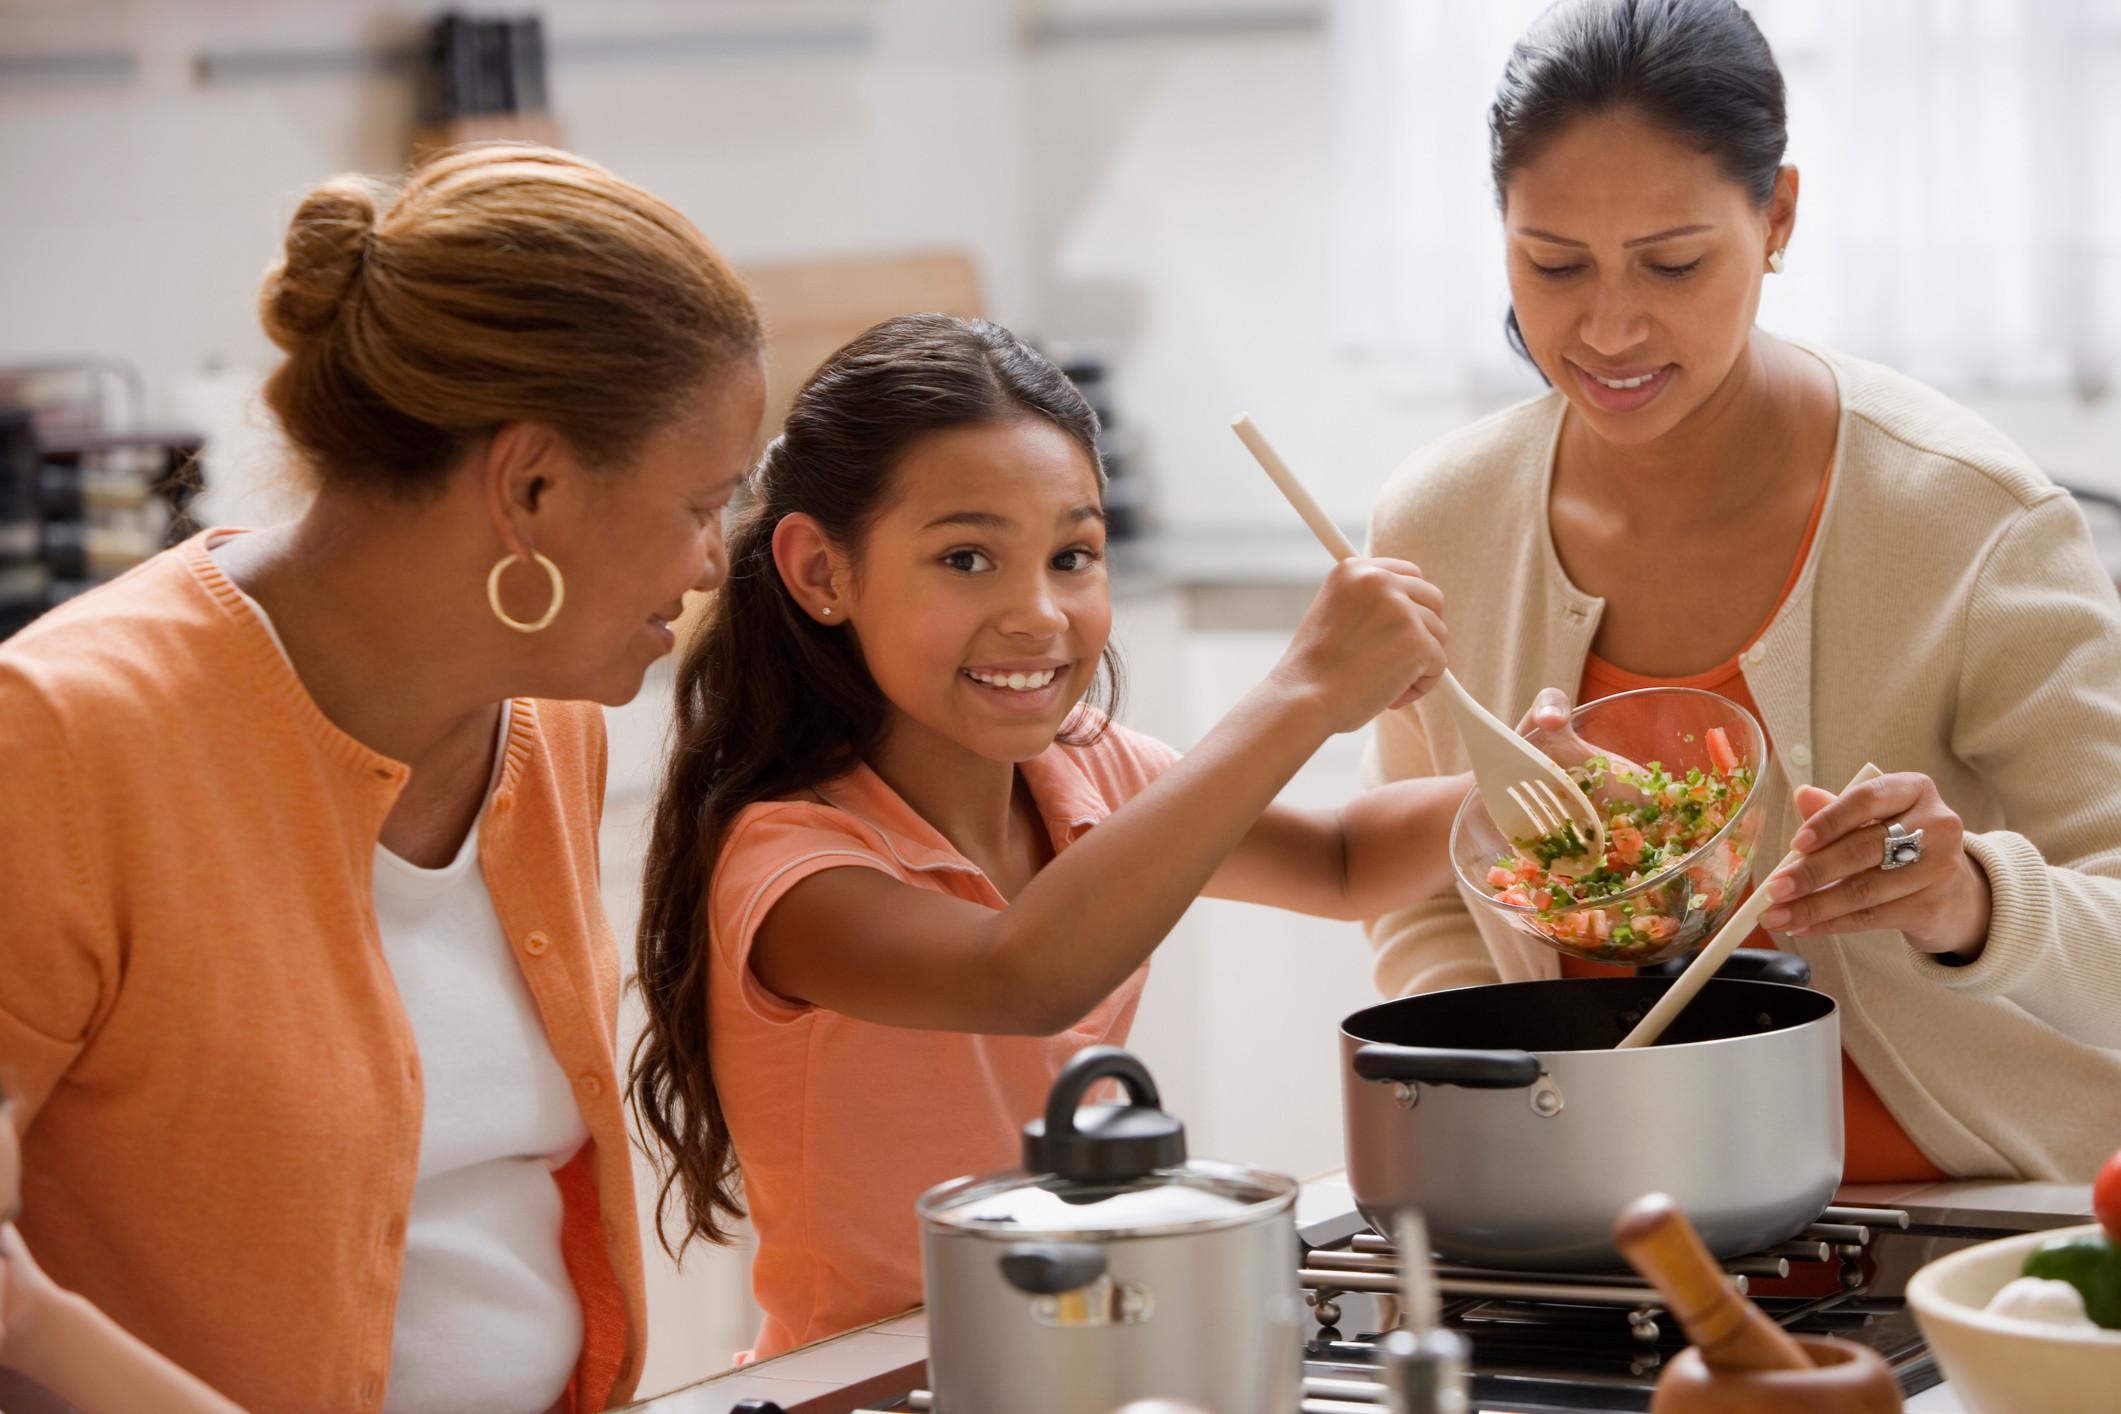 Kids Crushin' it in the Kitchen